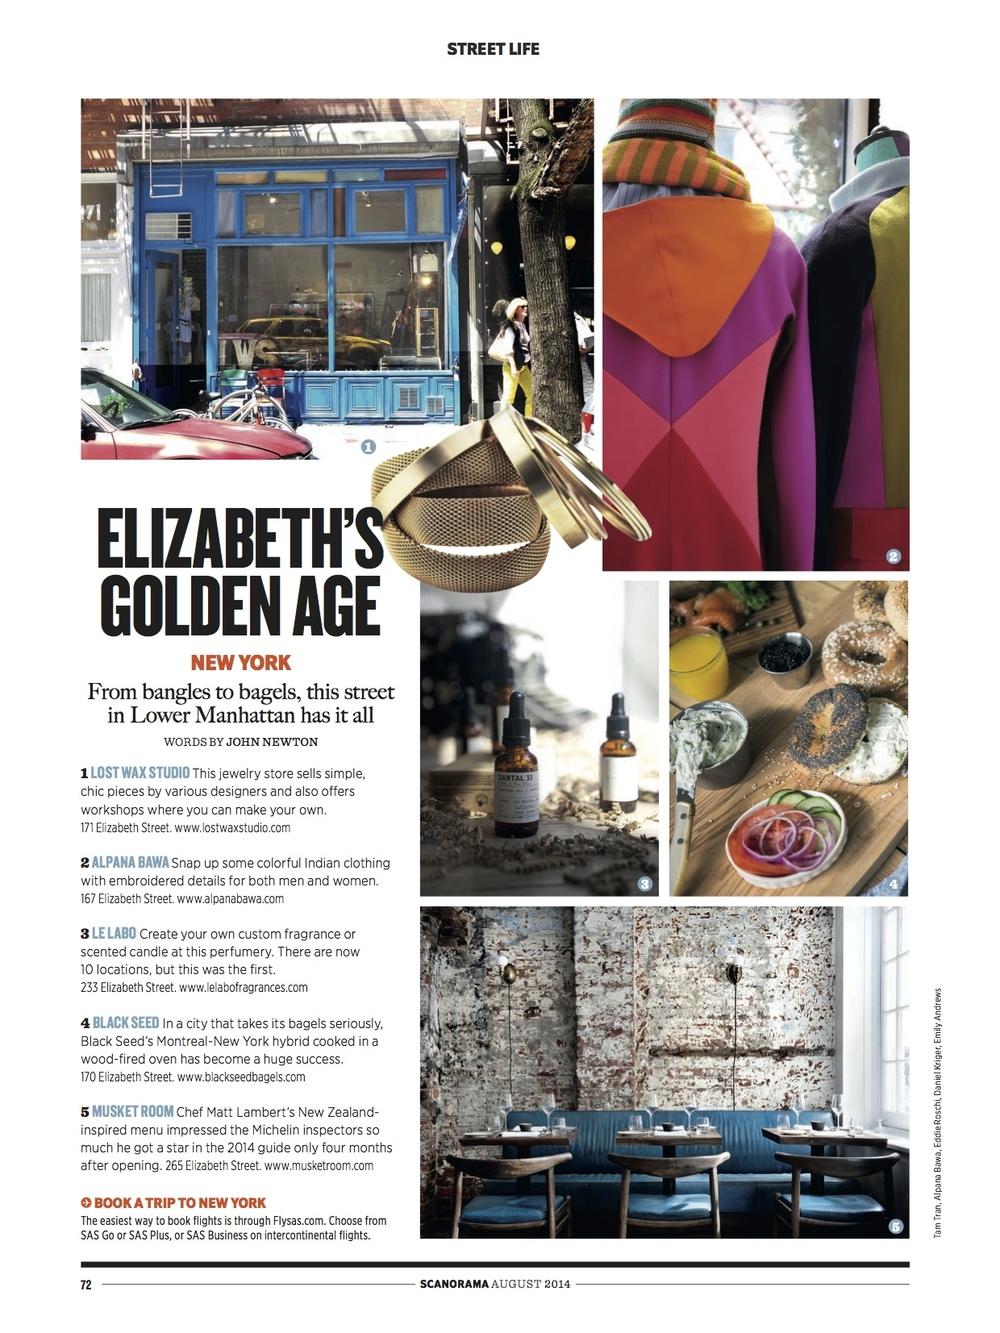 Eliz Street Life.jpg